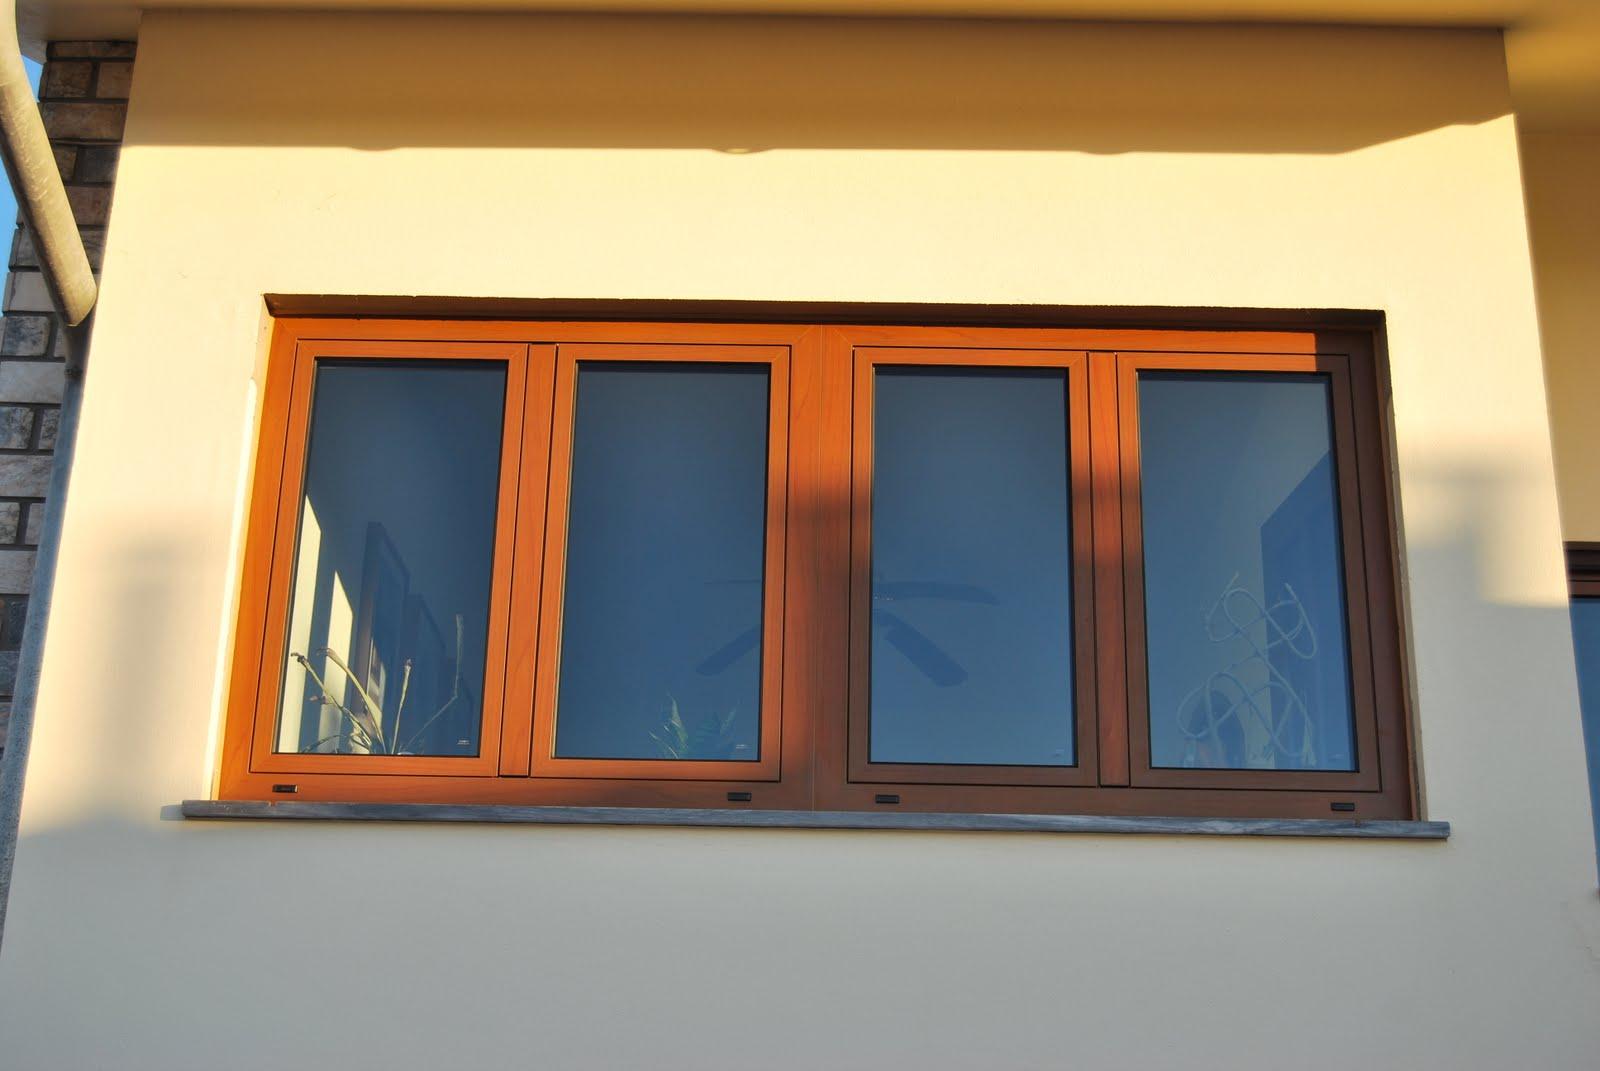 #C69905 acabamento e tratamento termolacado efeito madeira. 56 Janelas De Vidro Duplo Brasil